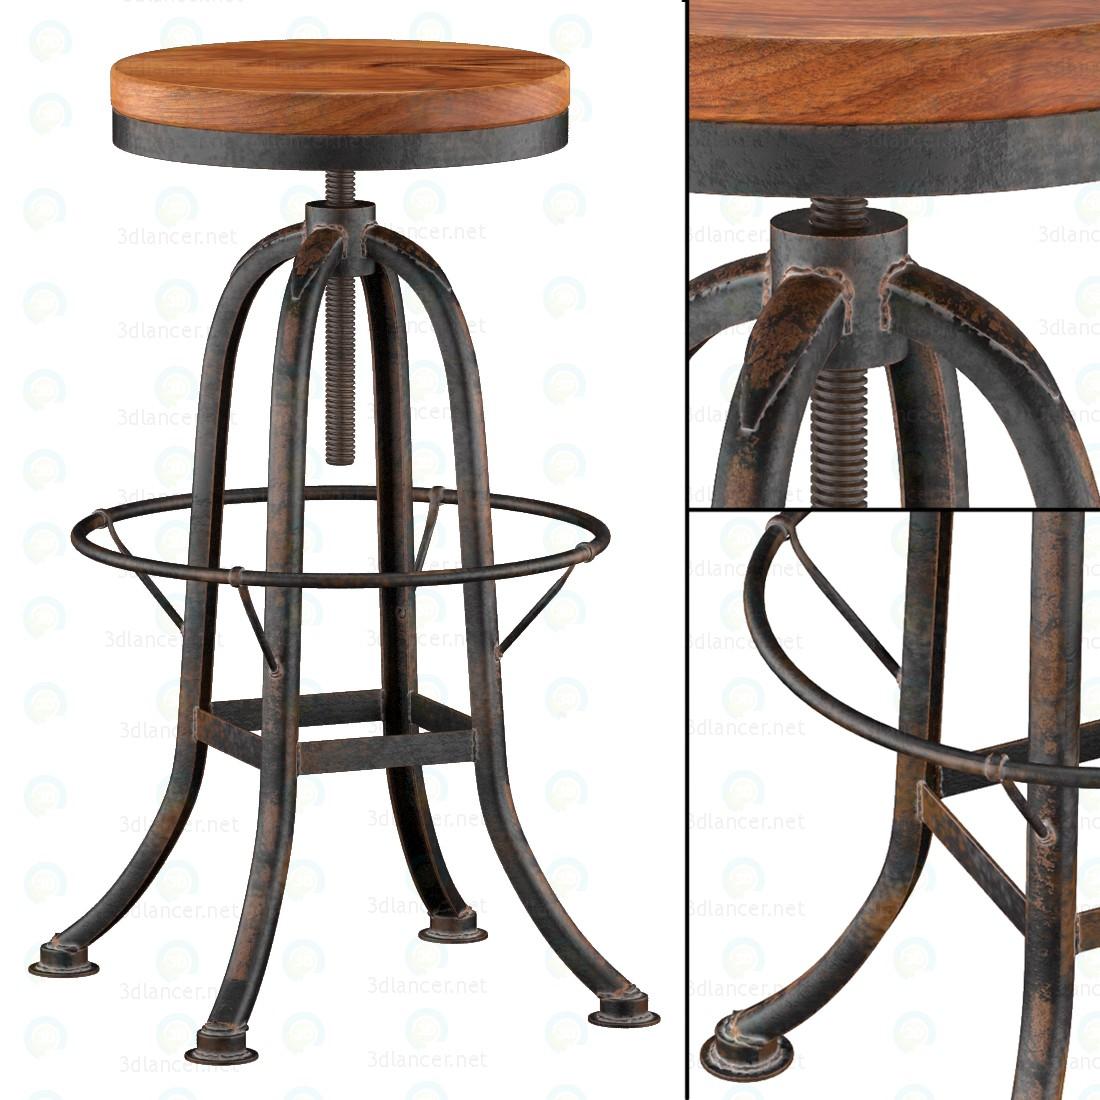 Loft Iron Base Reclaimed Wood Bar Counter Stool Model Render